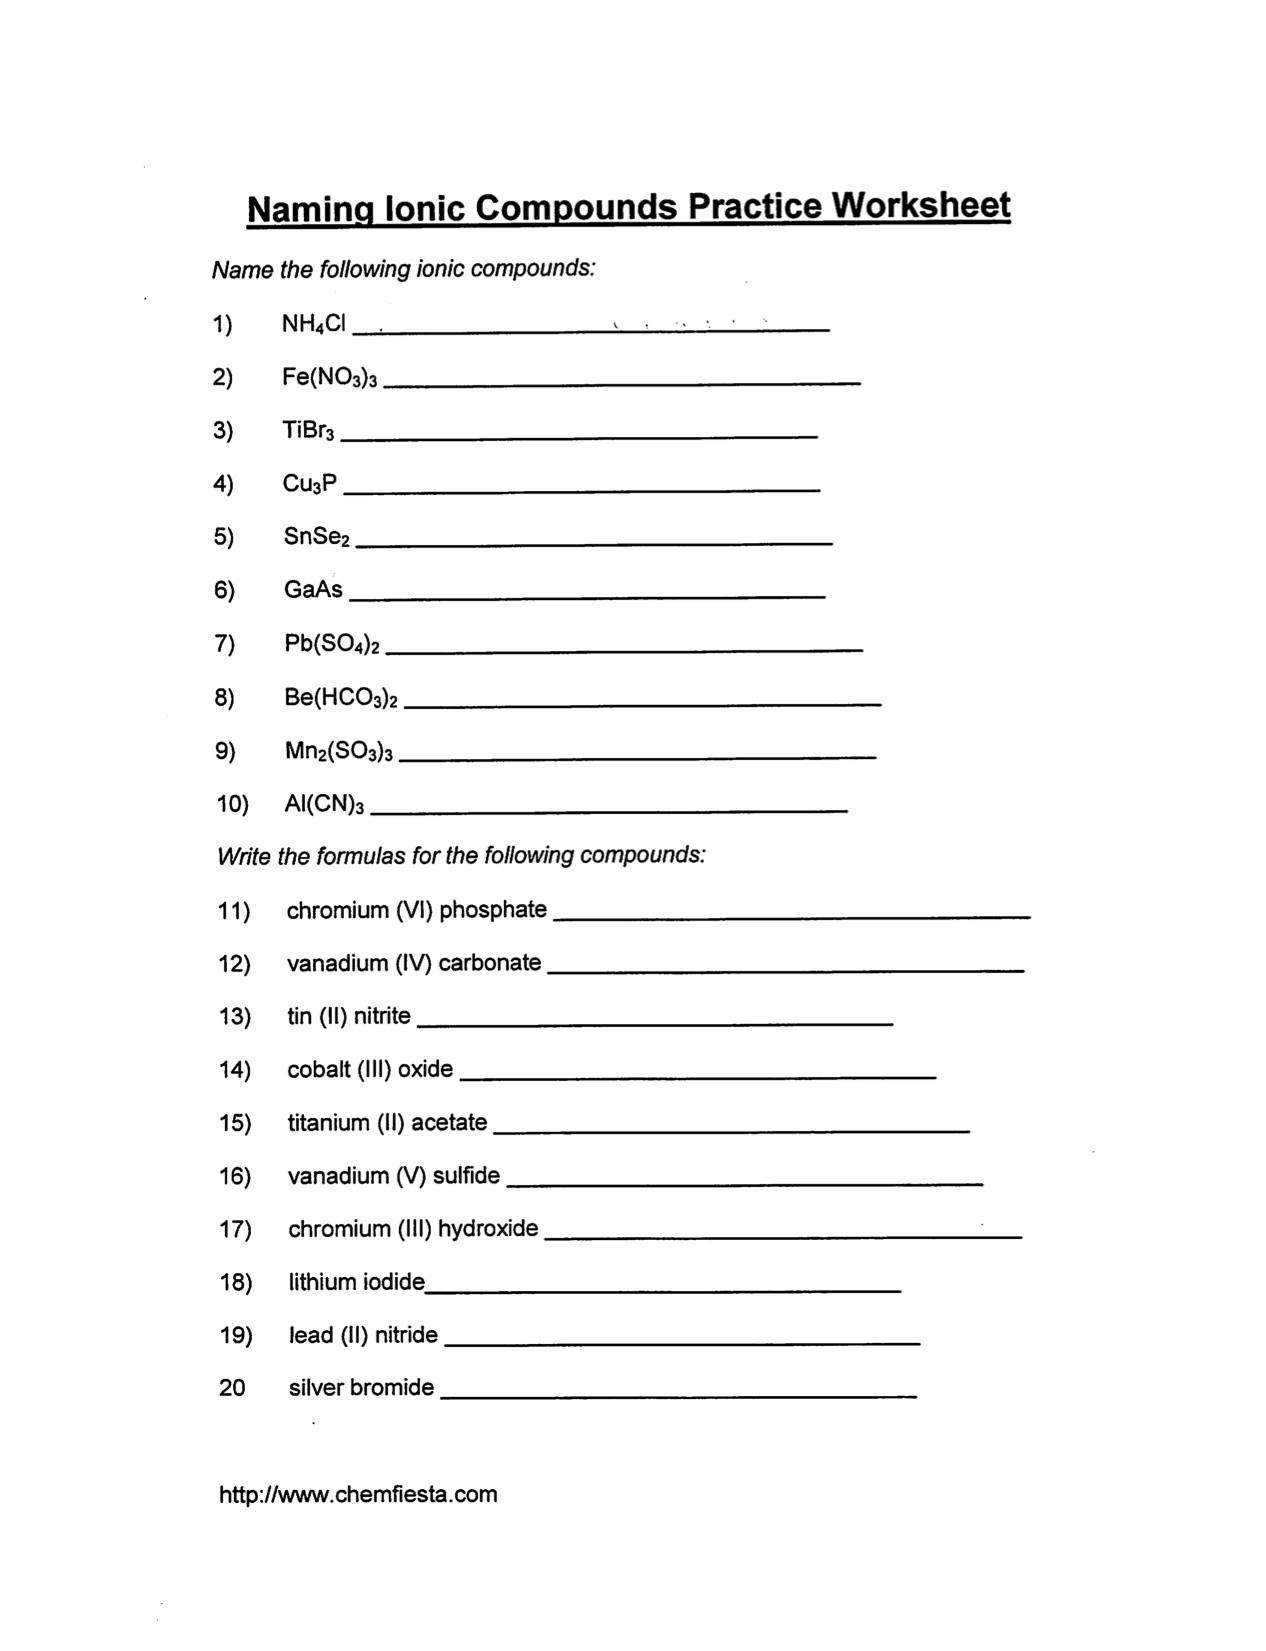 Chemistry Chemical Names And Formulas Worksheet - Worksheets